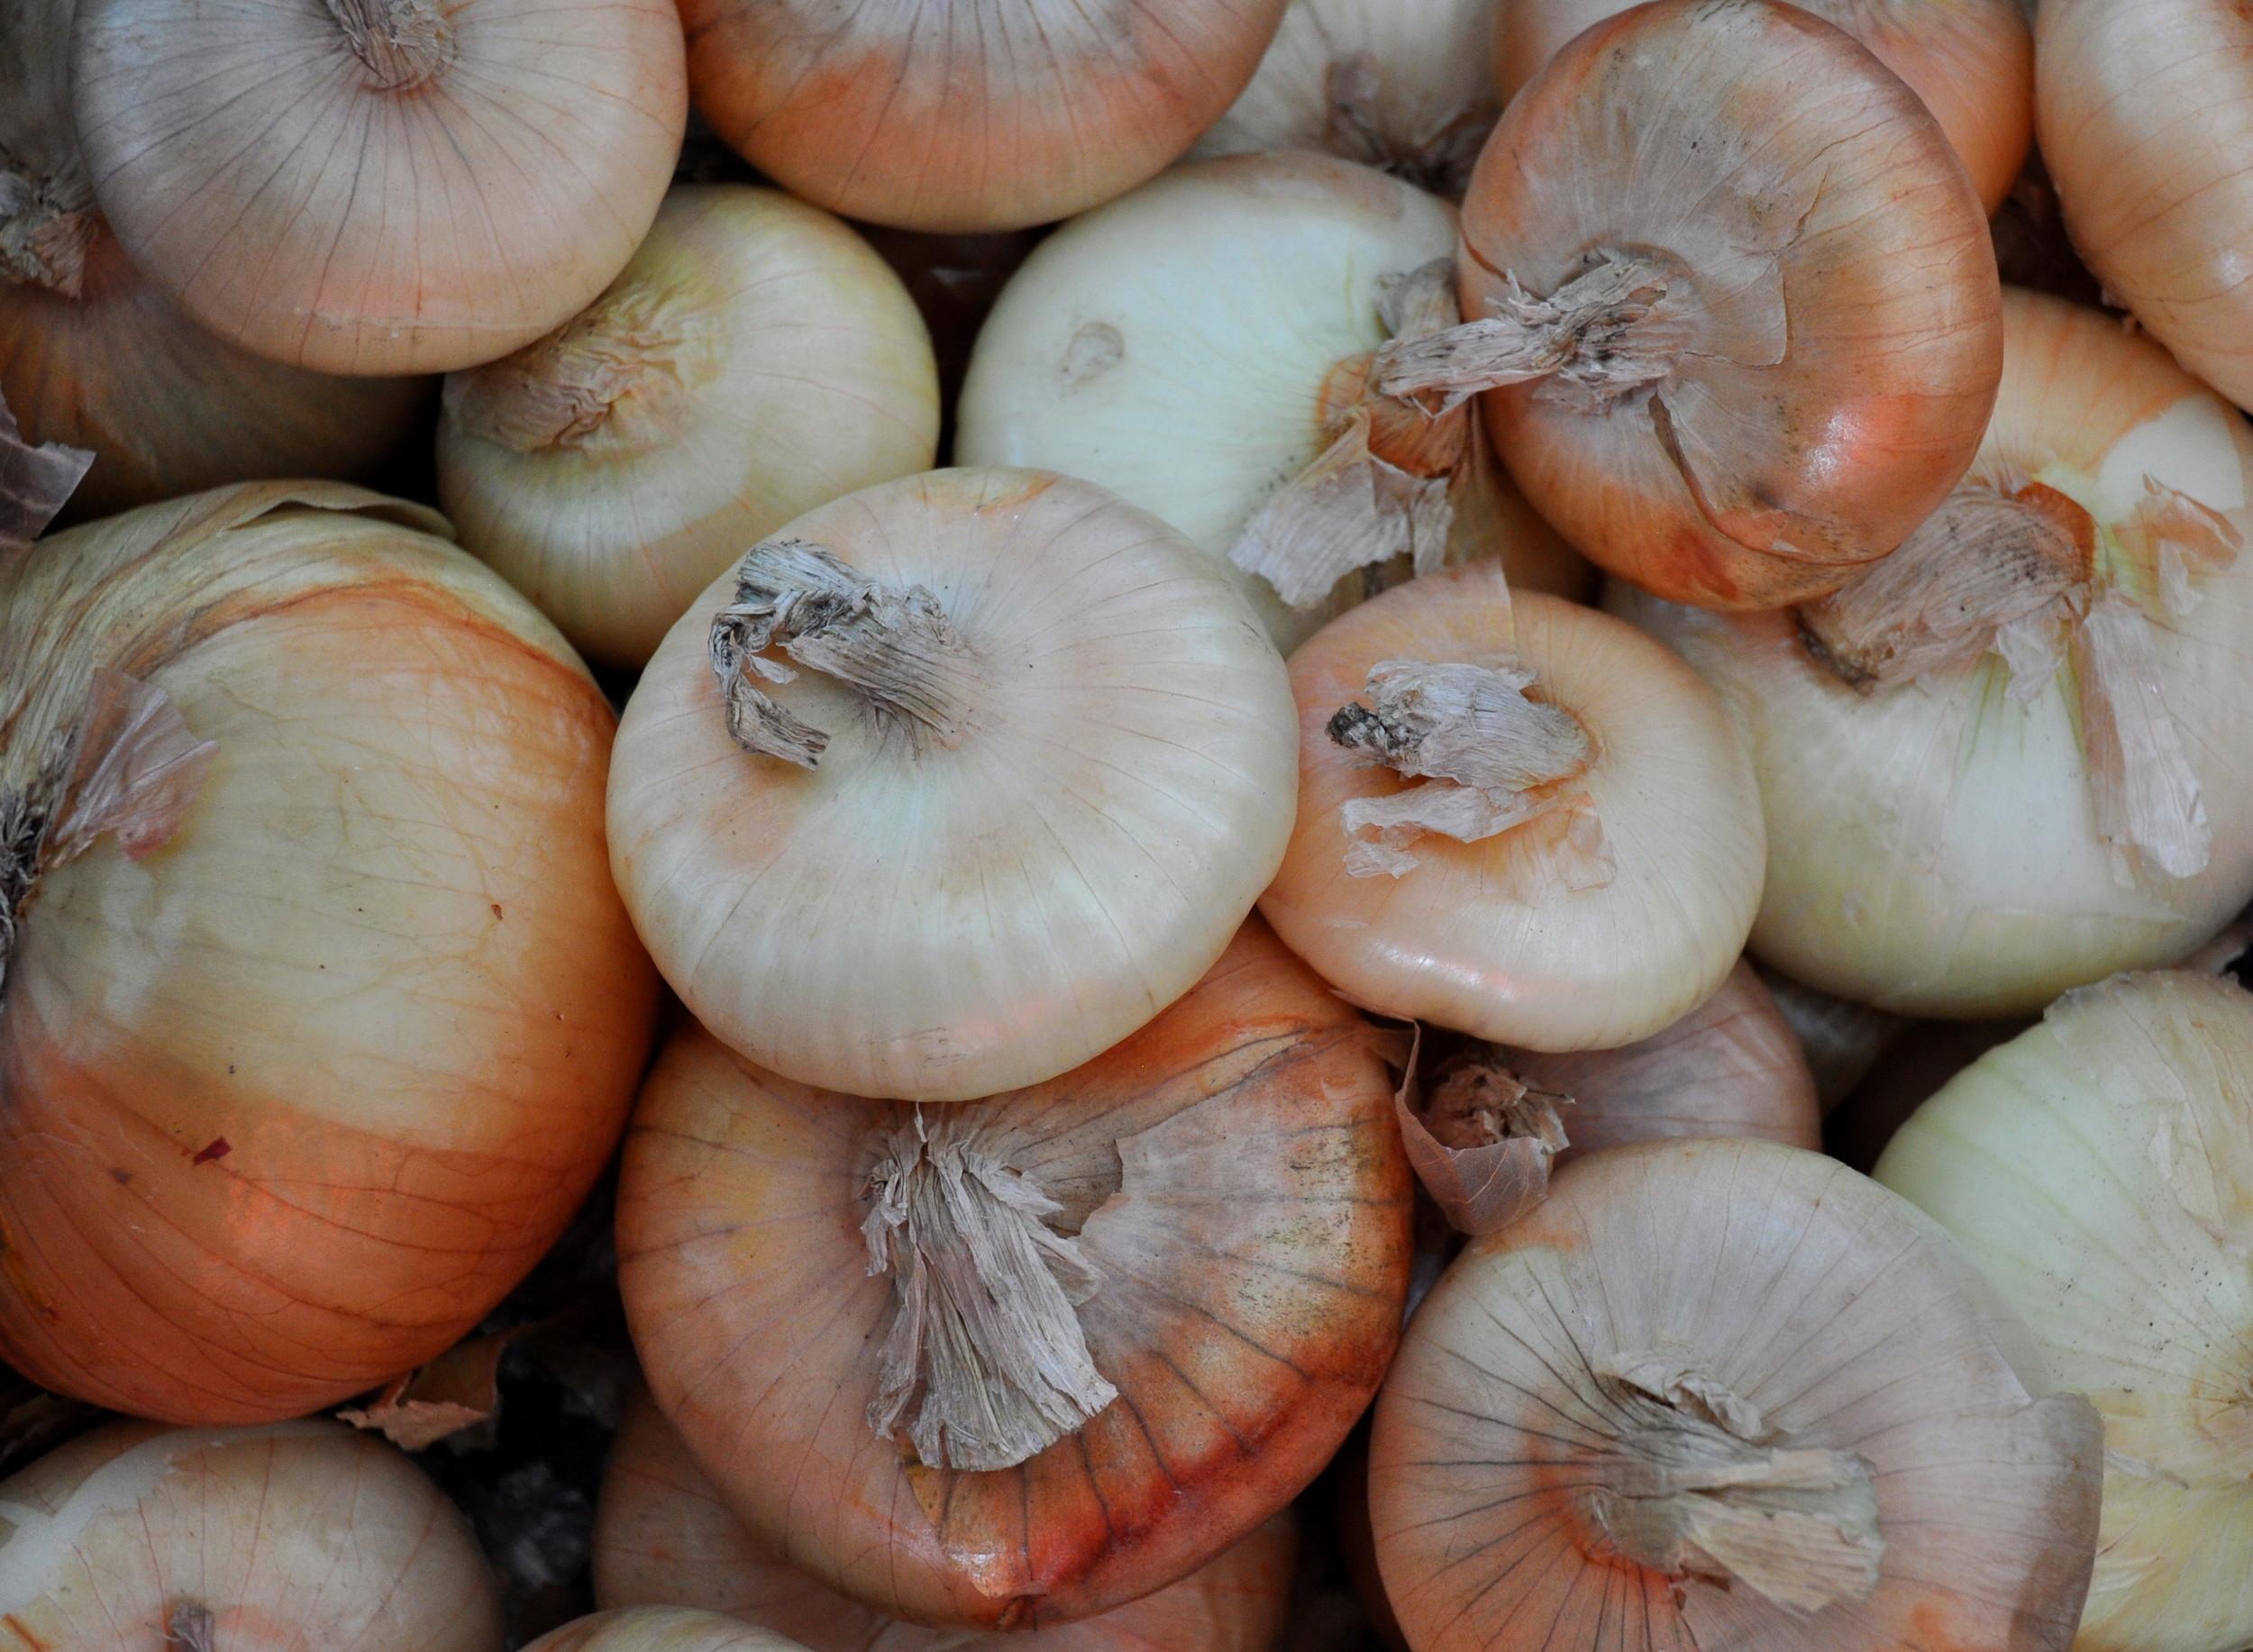 Cipollini onions from Colinwood Farm at Ballard Farmers Market. Copyright Zachary D. Lyons.